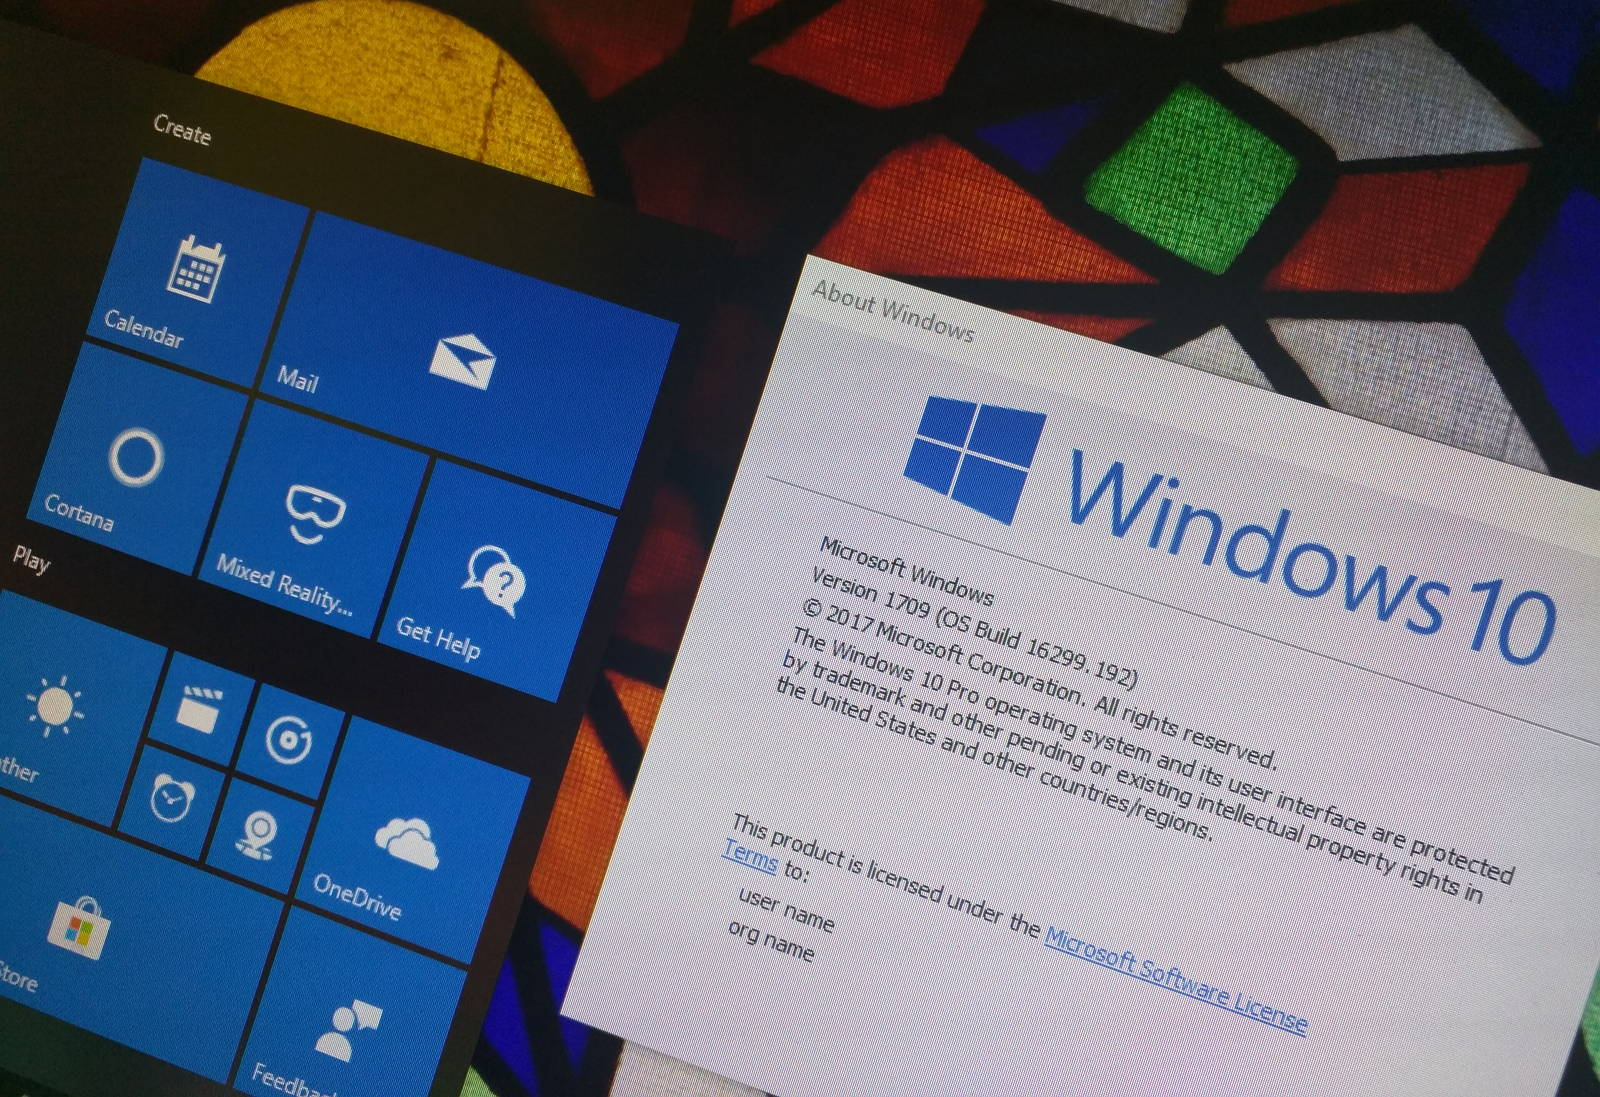 Windows 10 Fall Creators Update desktop with winver